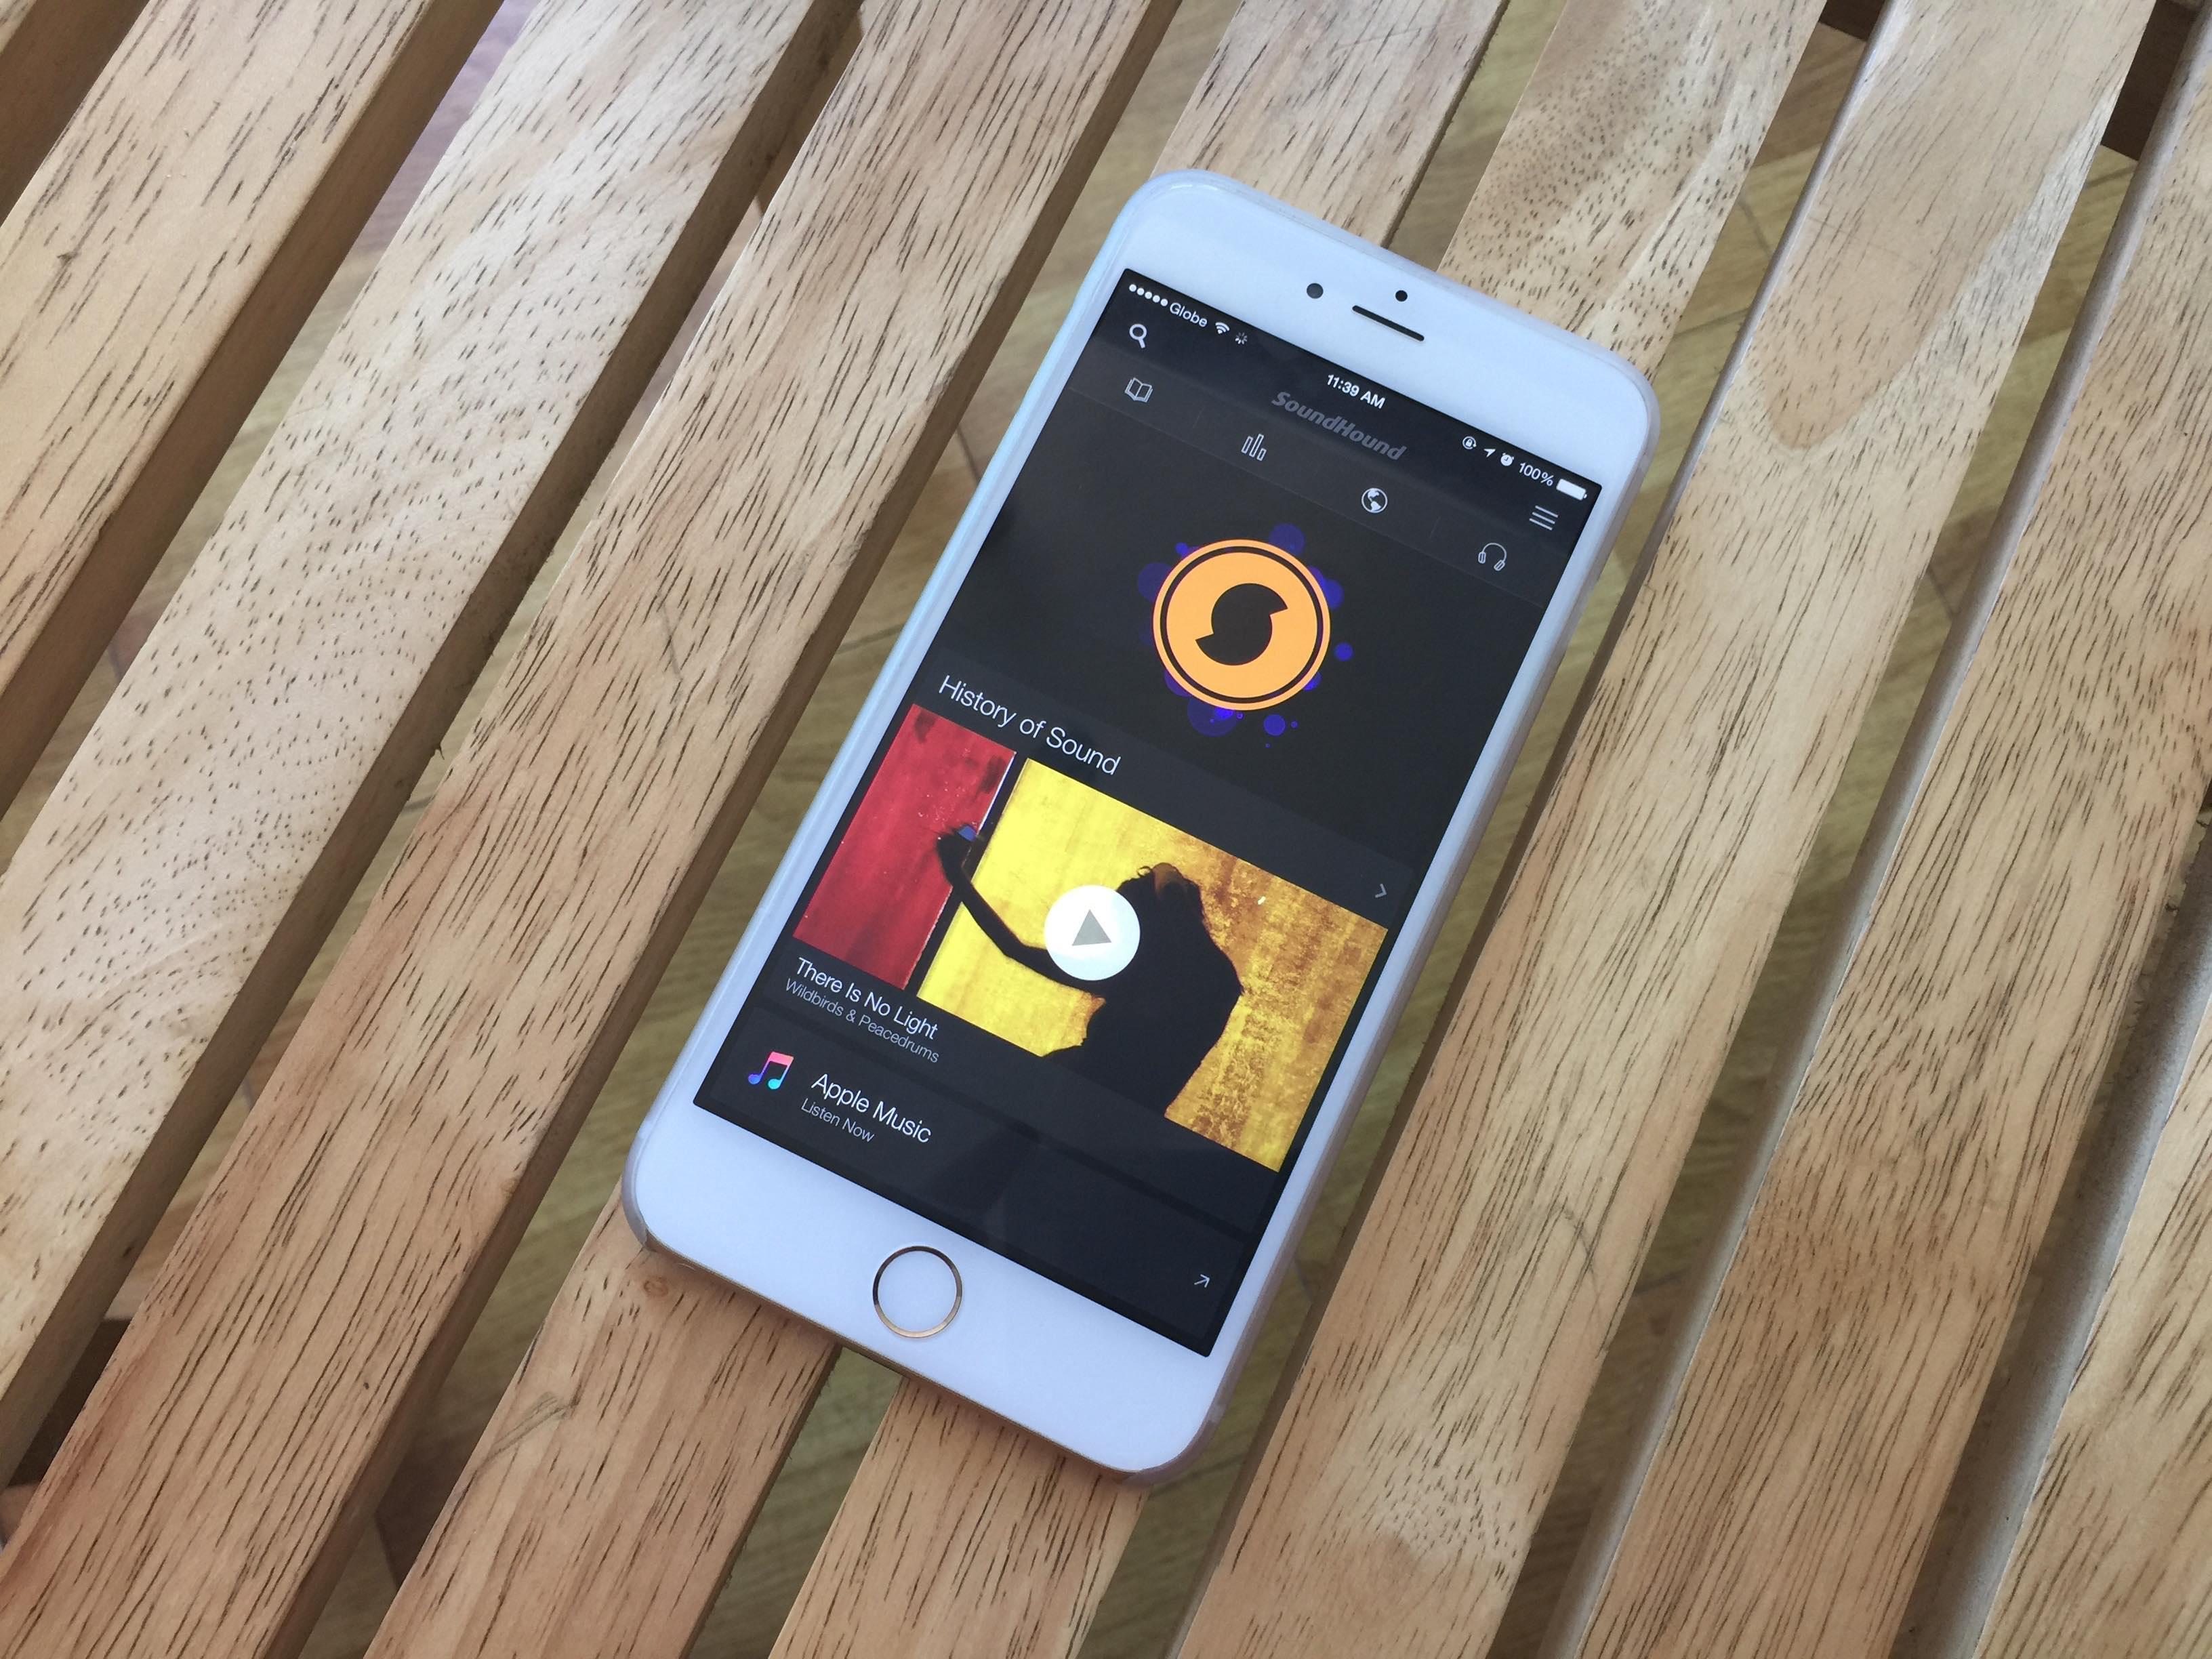 soundhound-plus-apple-music.jpg